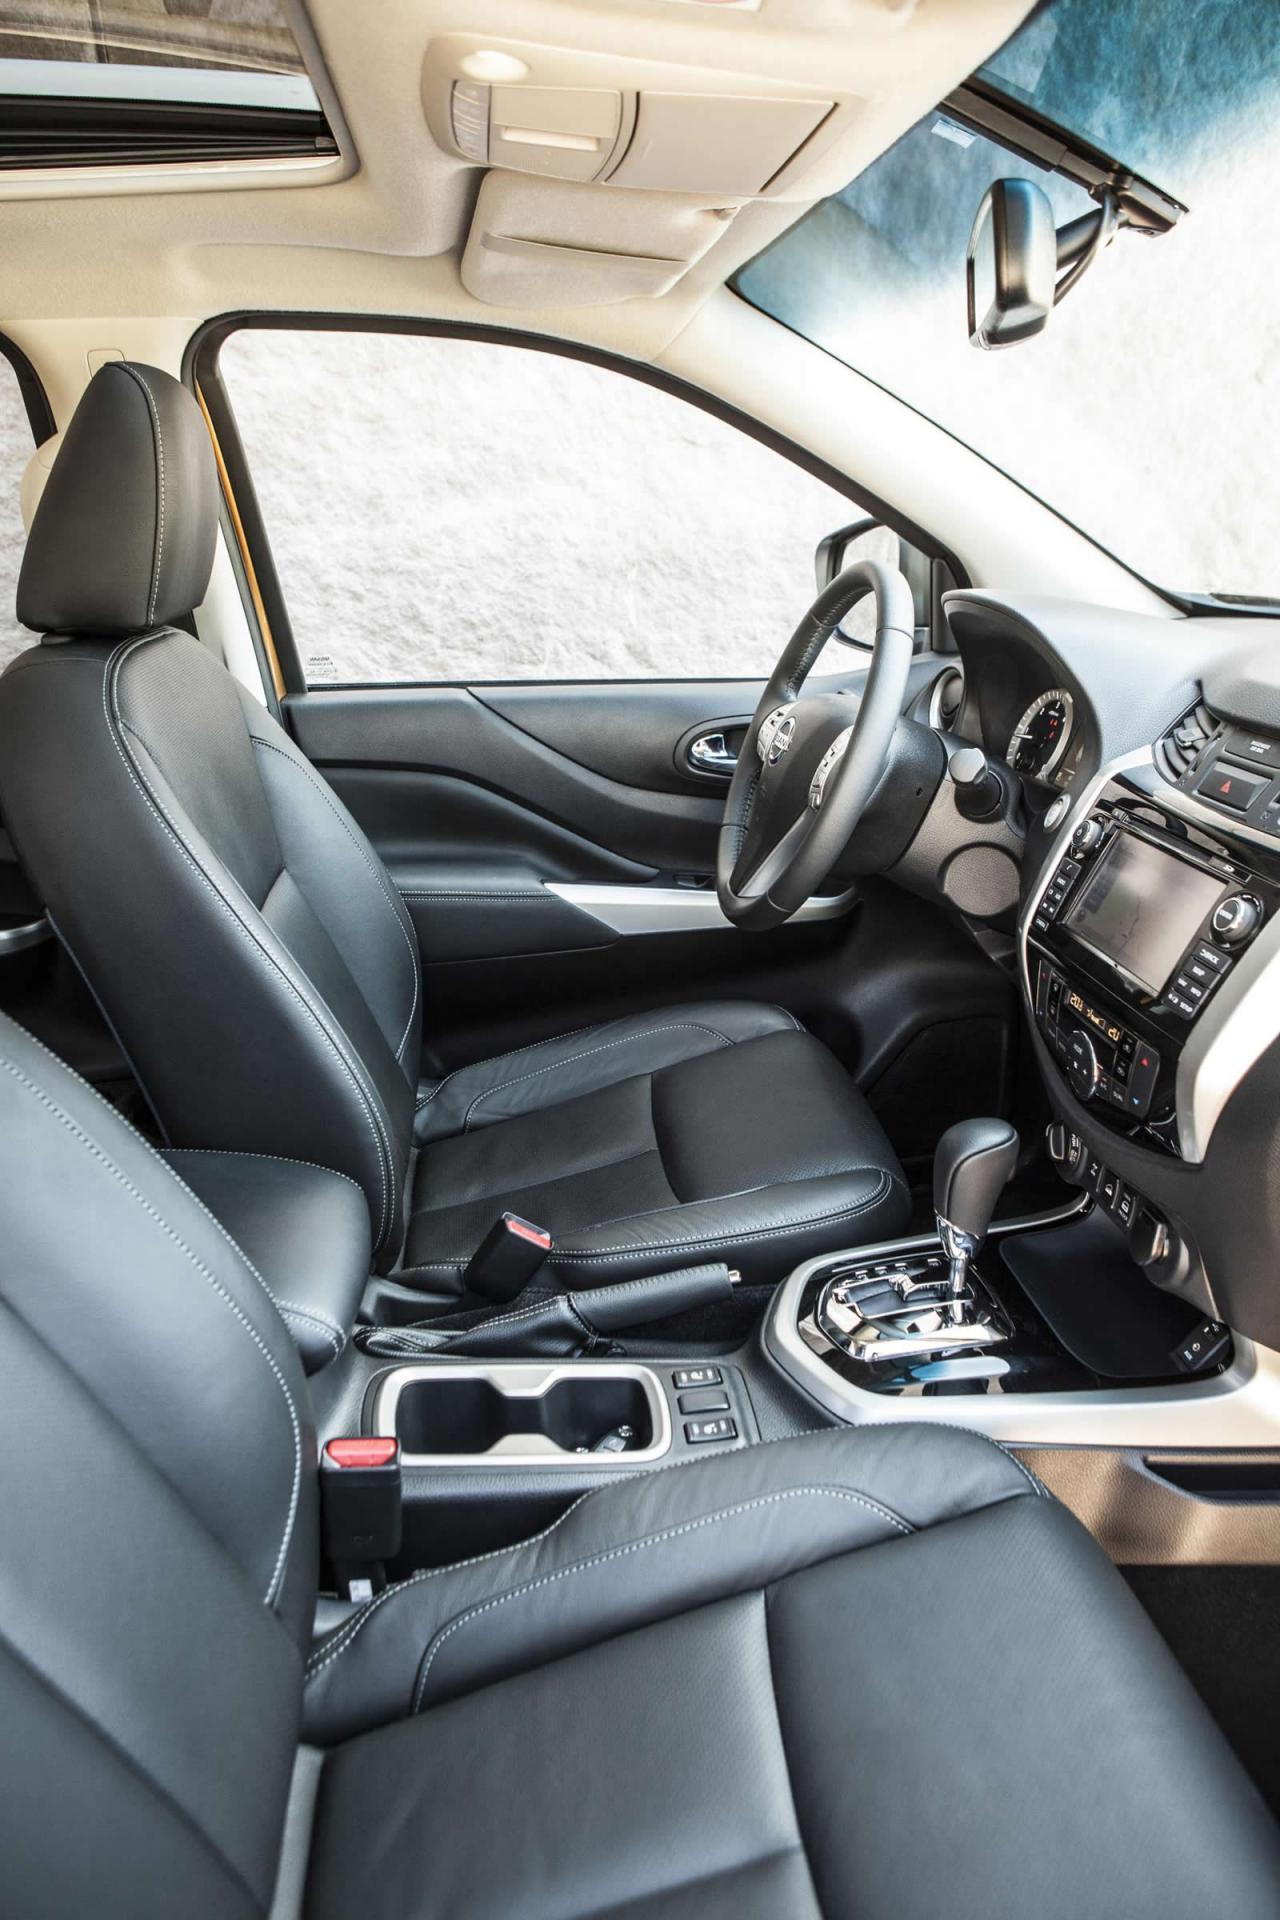 Nissan Navara NP300 2016 европейская версия